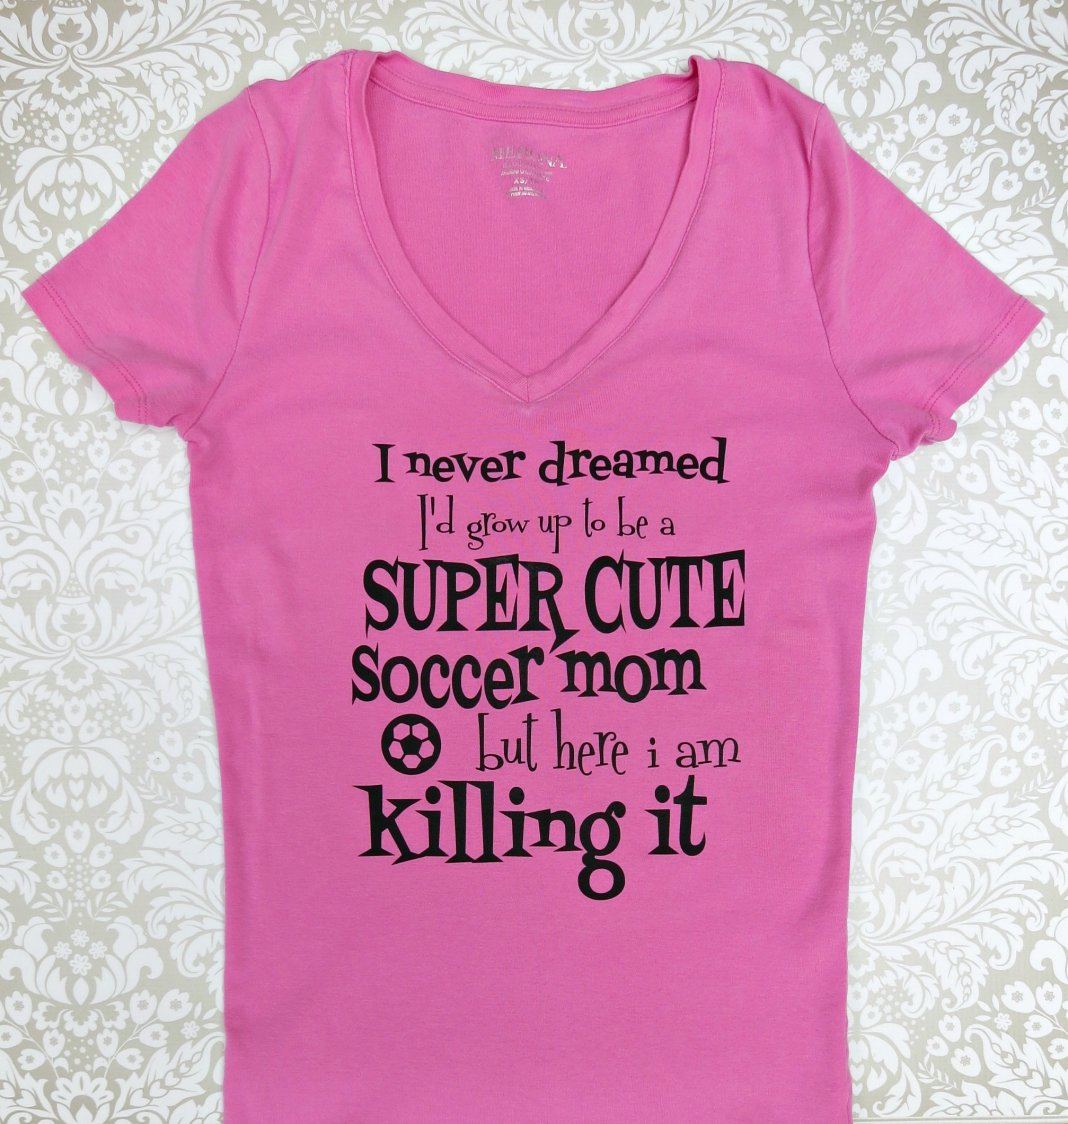 Super Cute Soccer Mom Shirt DIY - Morena's Corner